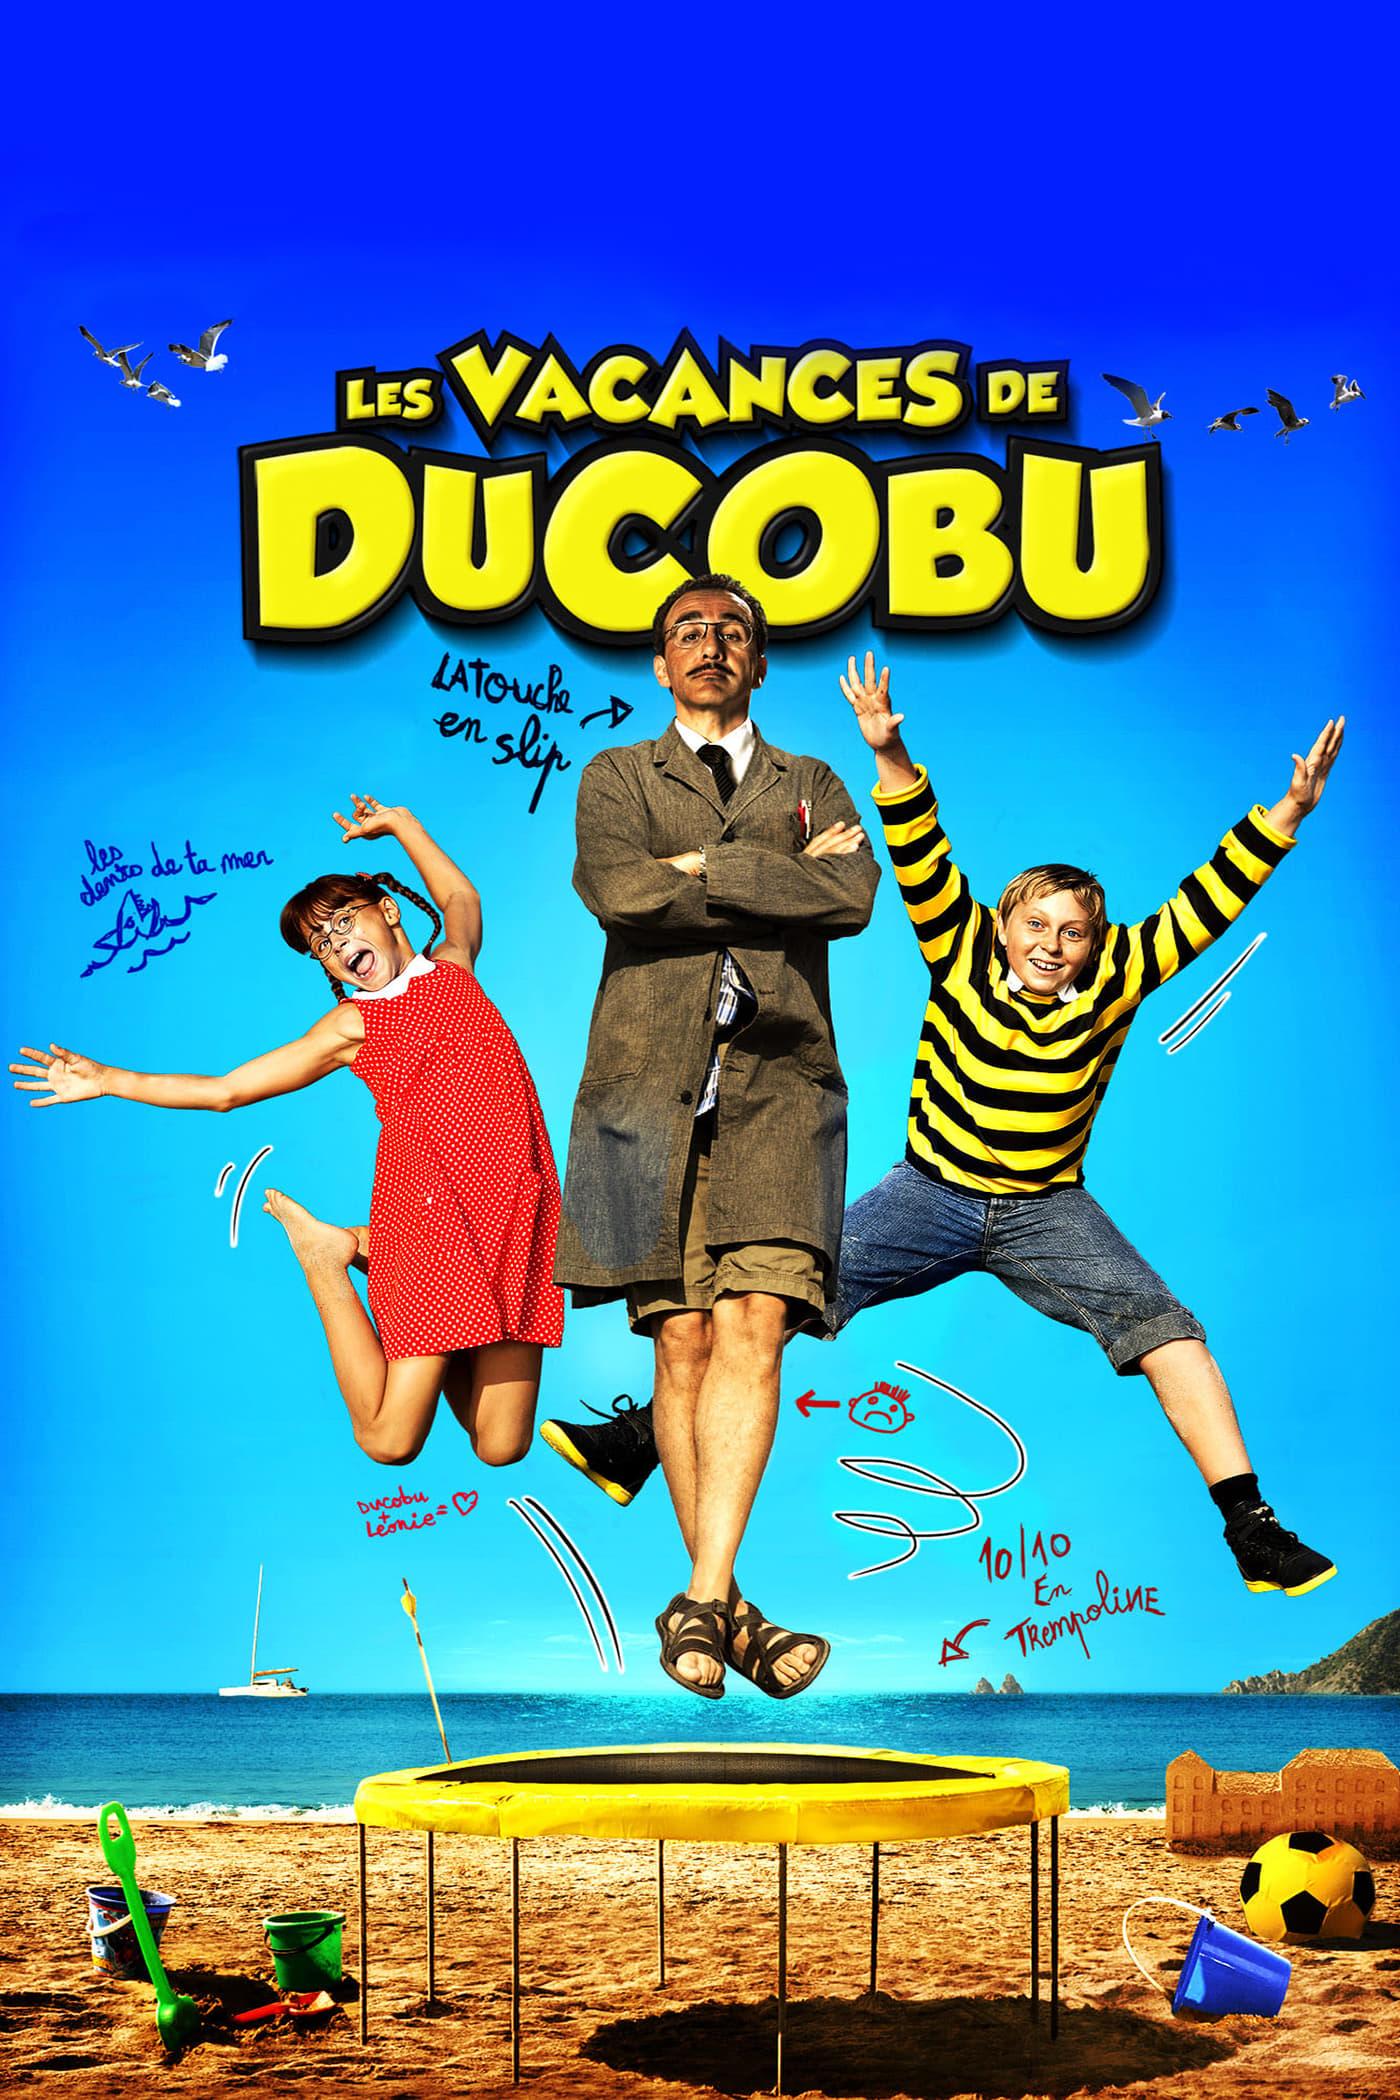 Les-Vacances-De-Ducobu-2012-4536